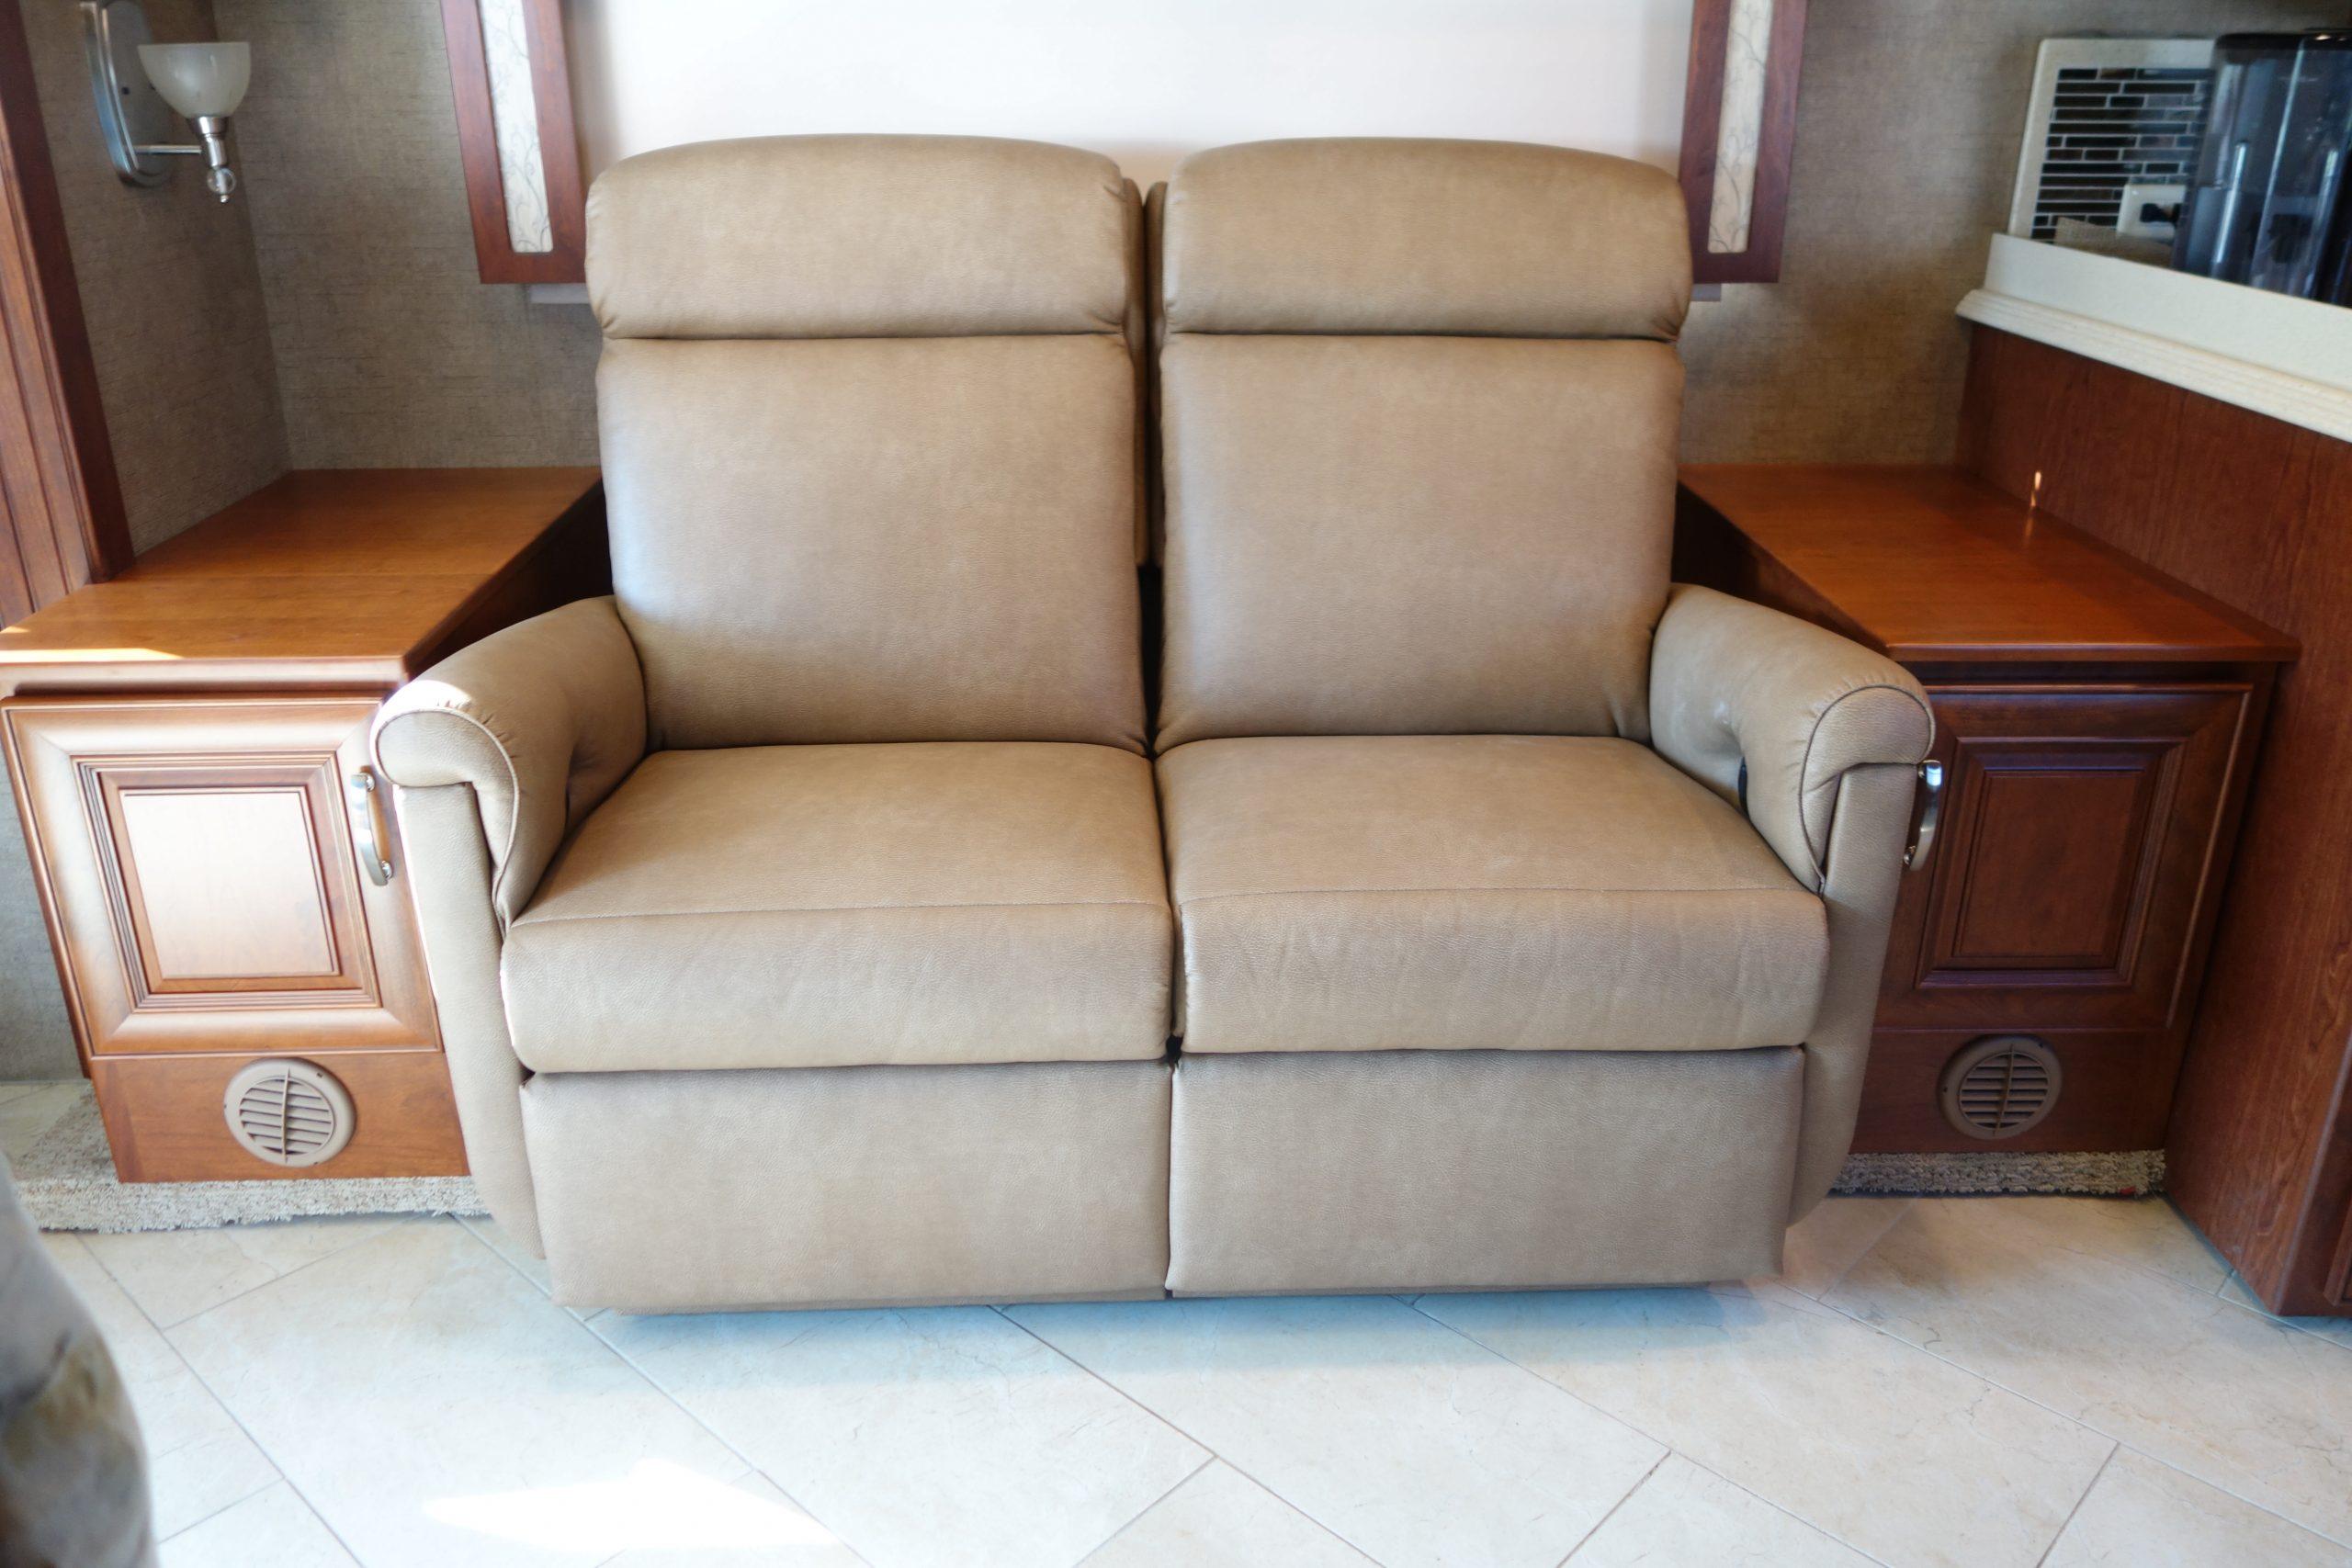 Custom RV speaker cabinets with sofa in between set